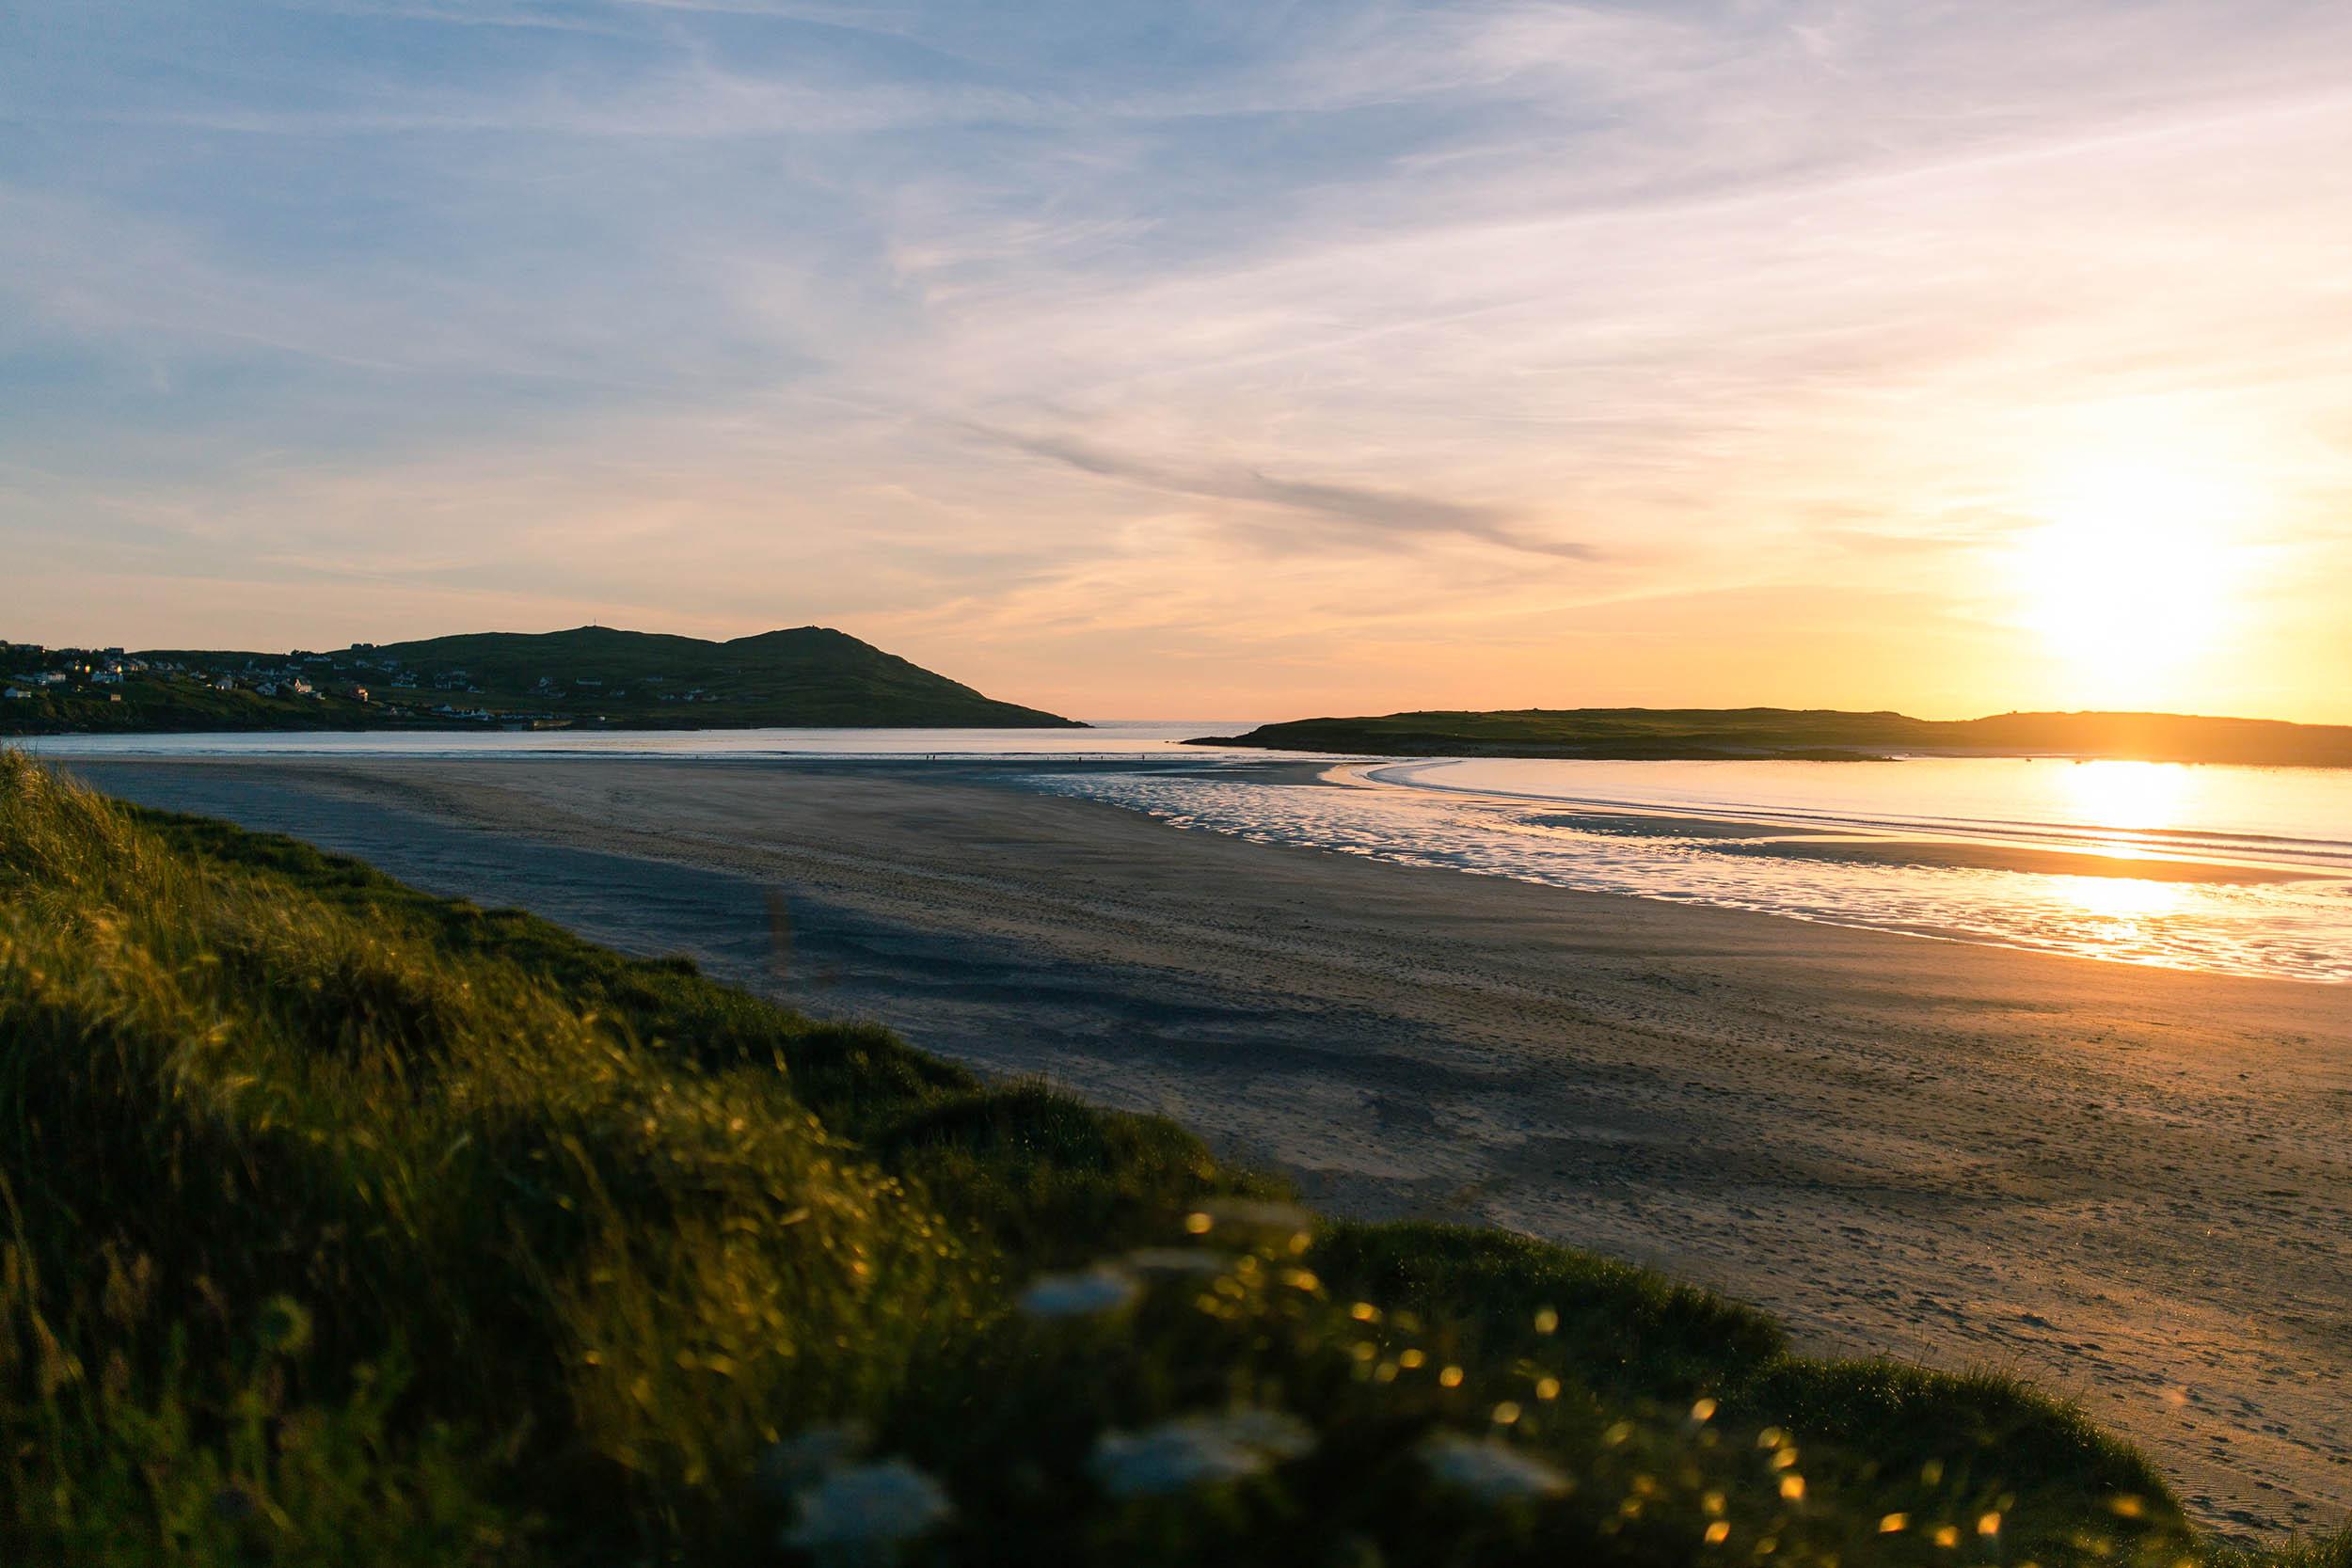 IRELAND_DONEGAL_PORTNOO_0052